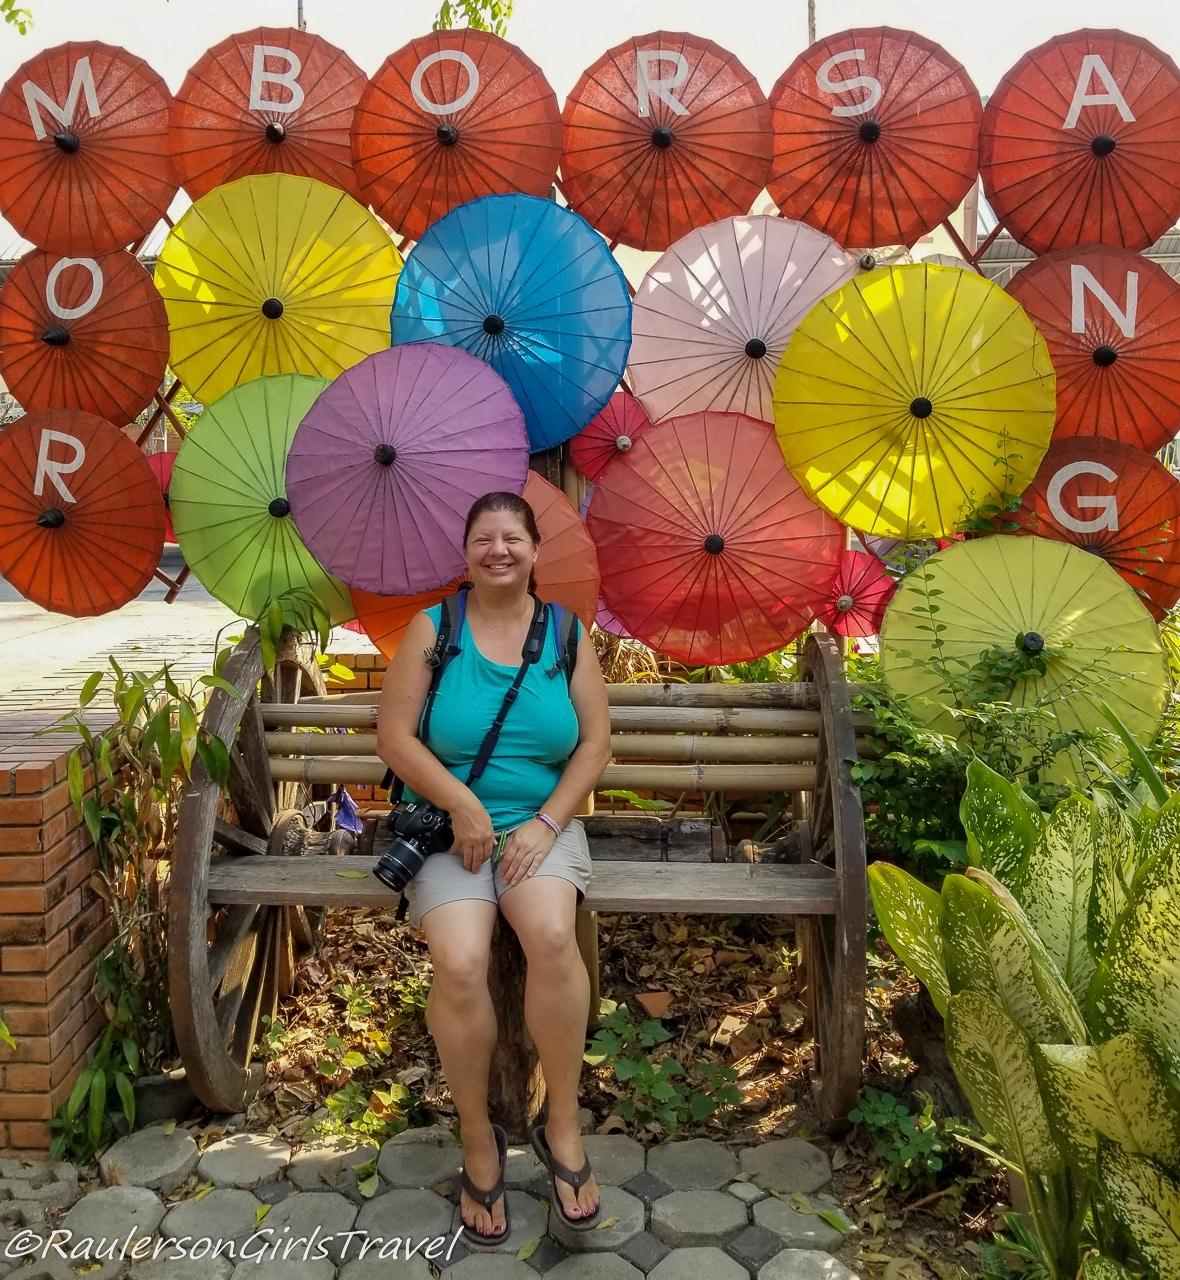 Heather at Romborsang Umbrella Factory